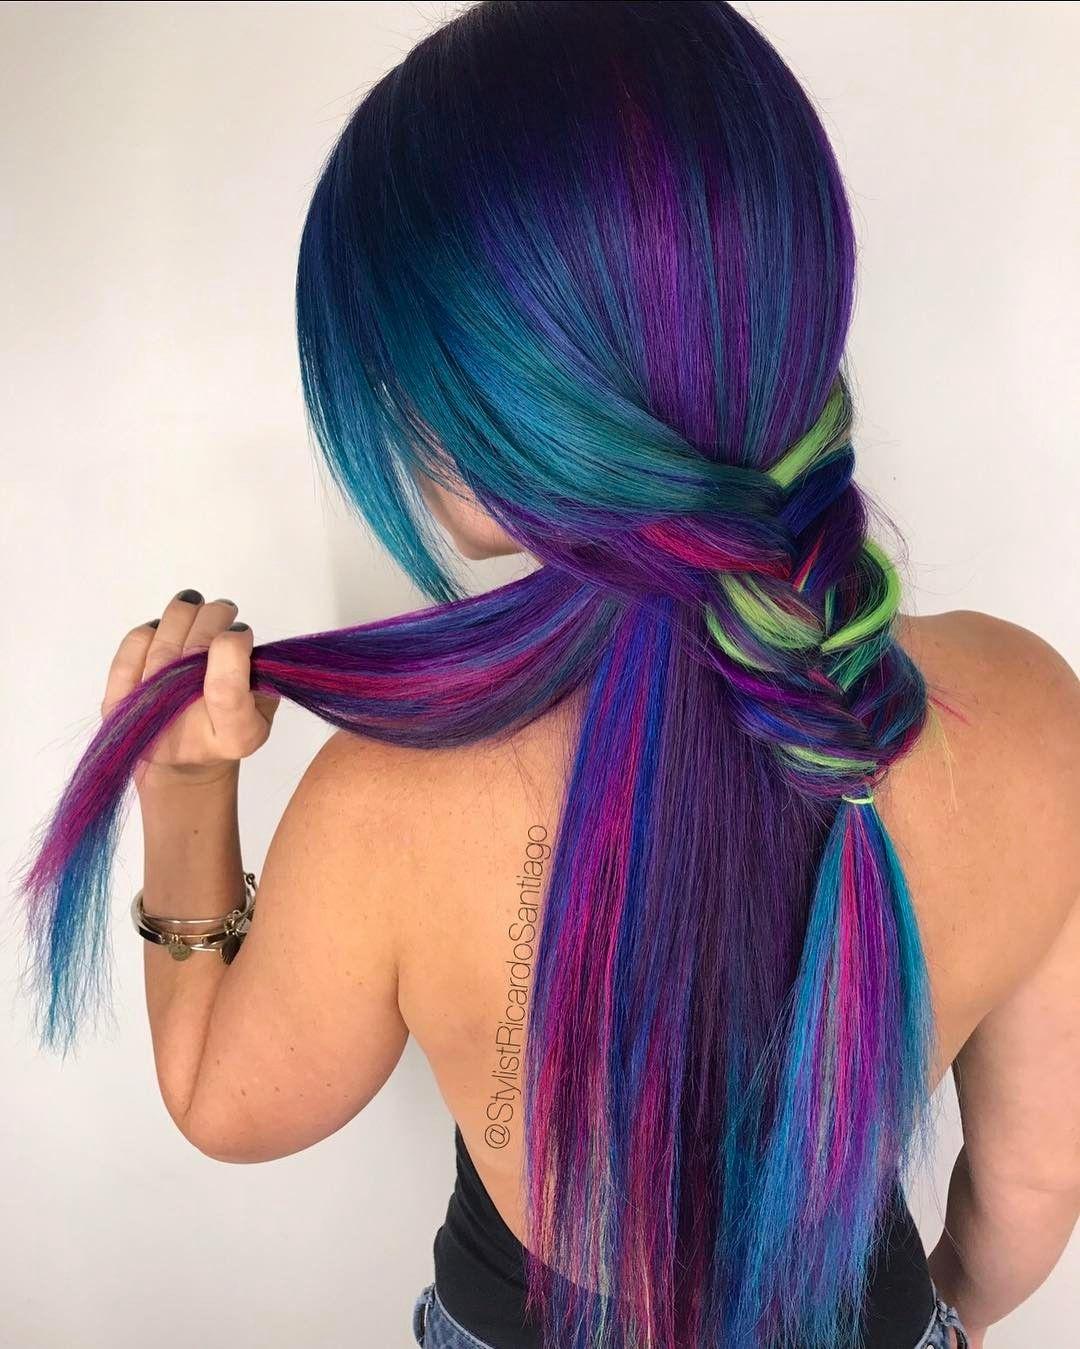 Pin by hair ftw on vibrant hair pinterest santiago orlando and